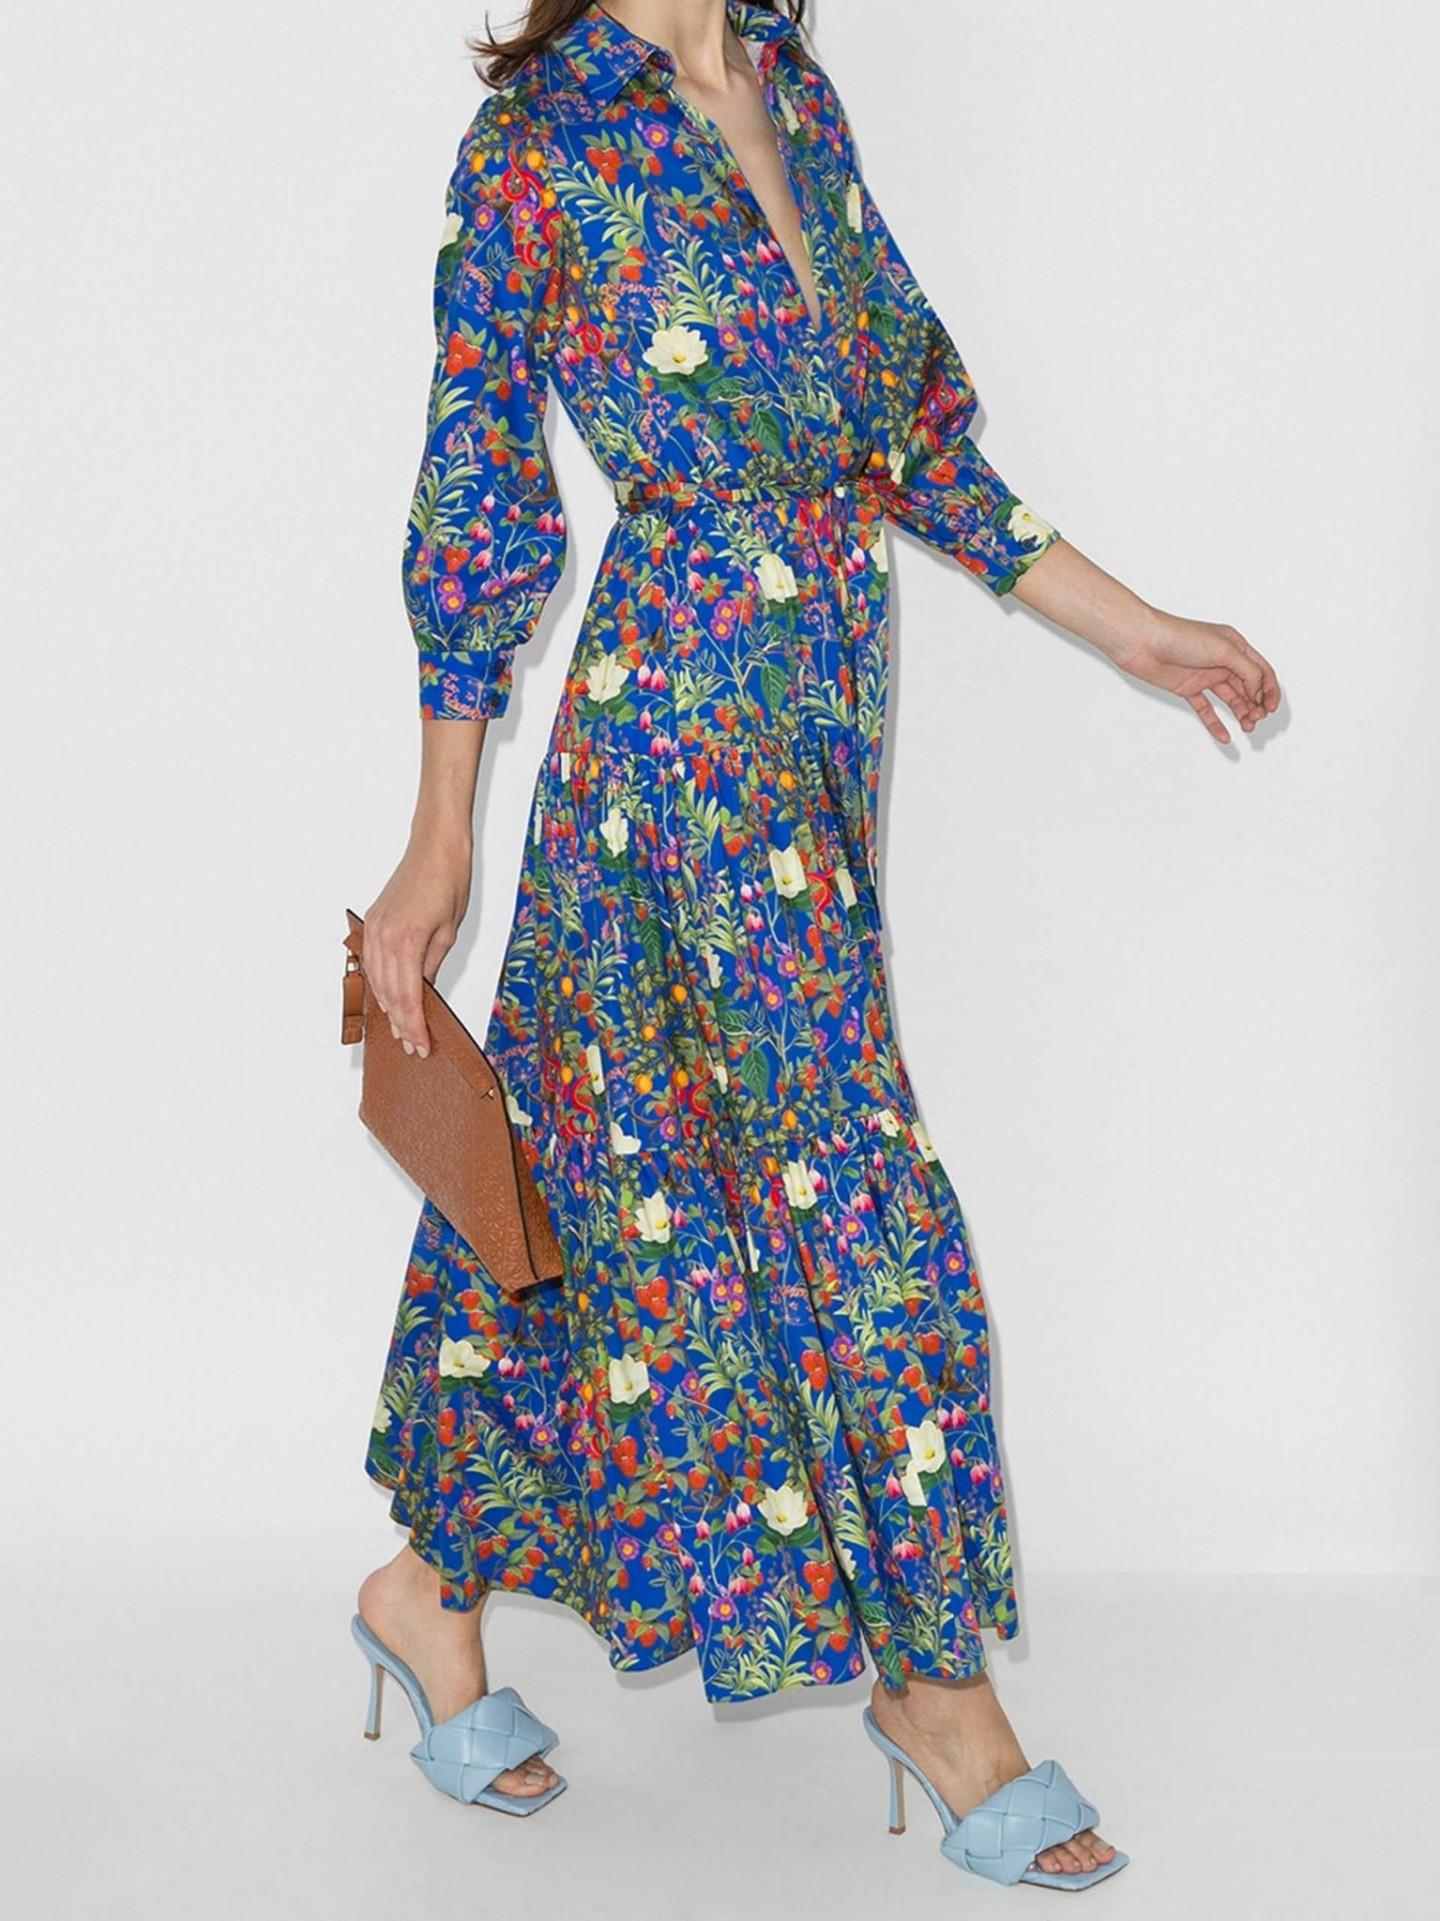 BORGO DE NOR Clarissa Floral Shirt Dress